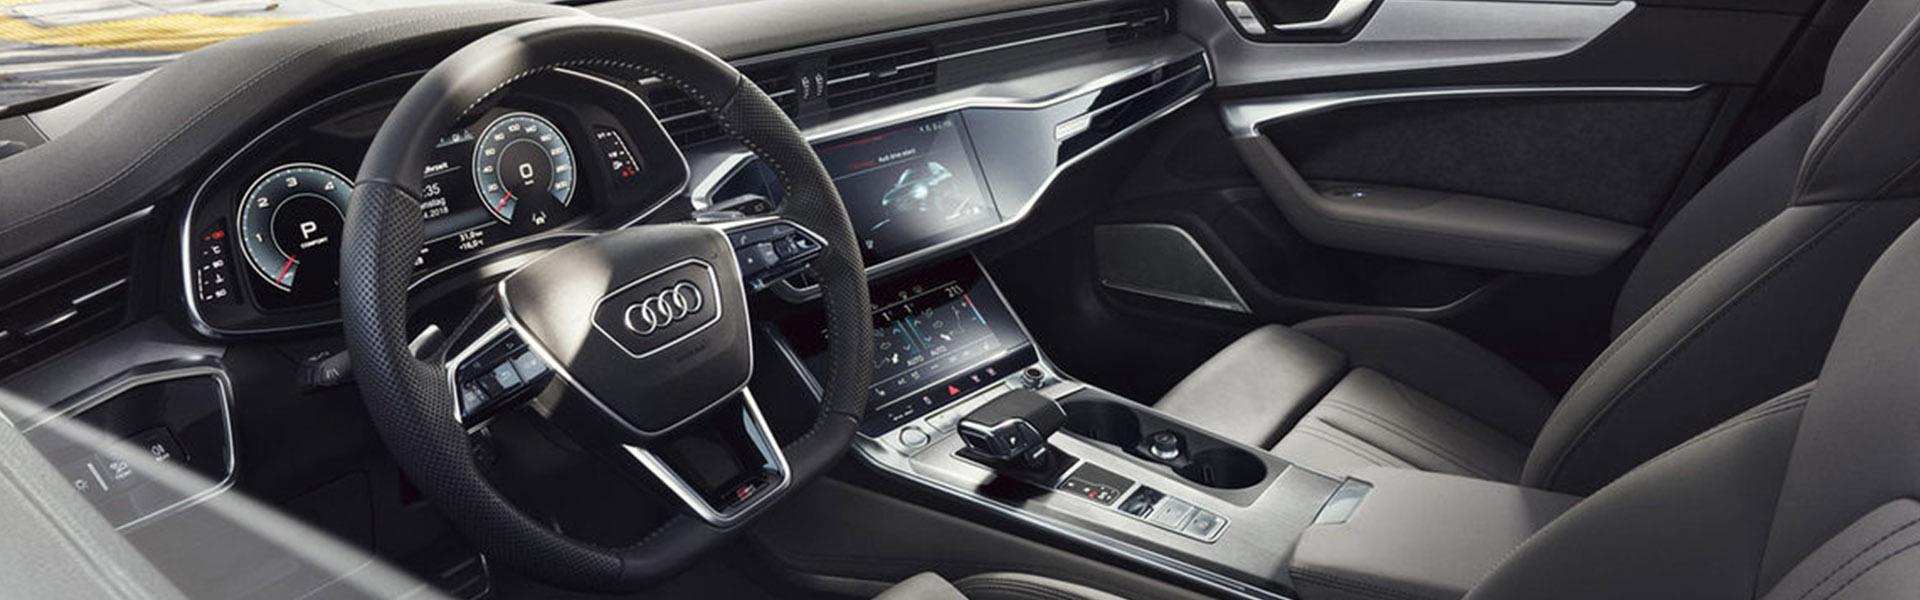 Audi A6 Innenraum